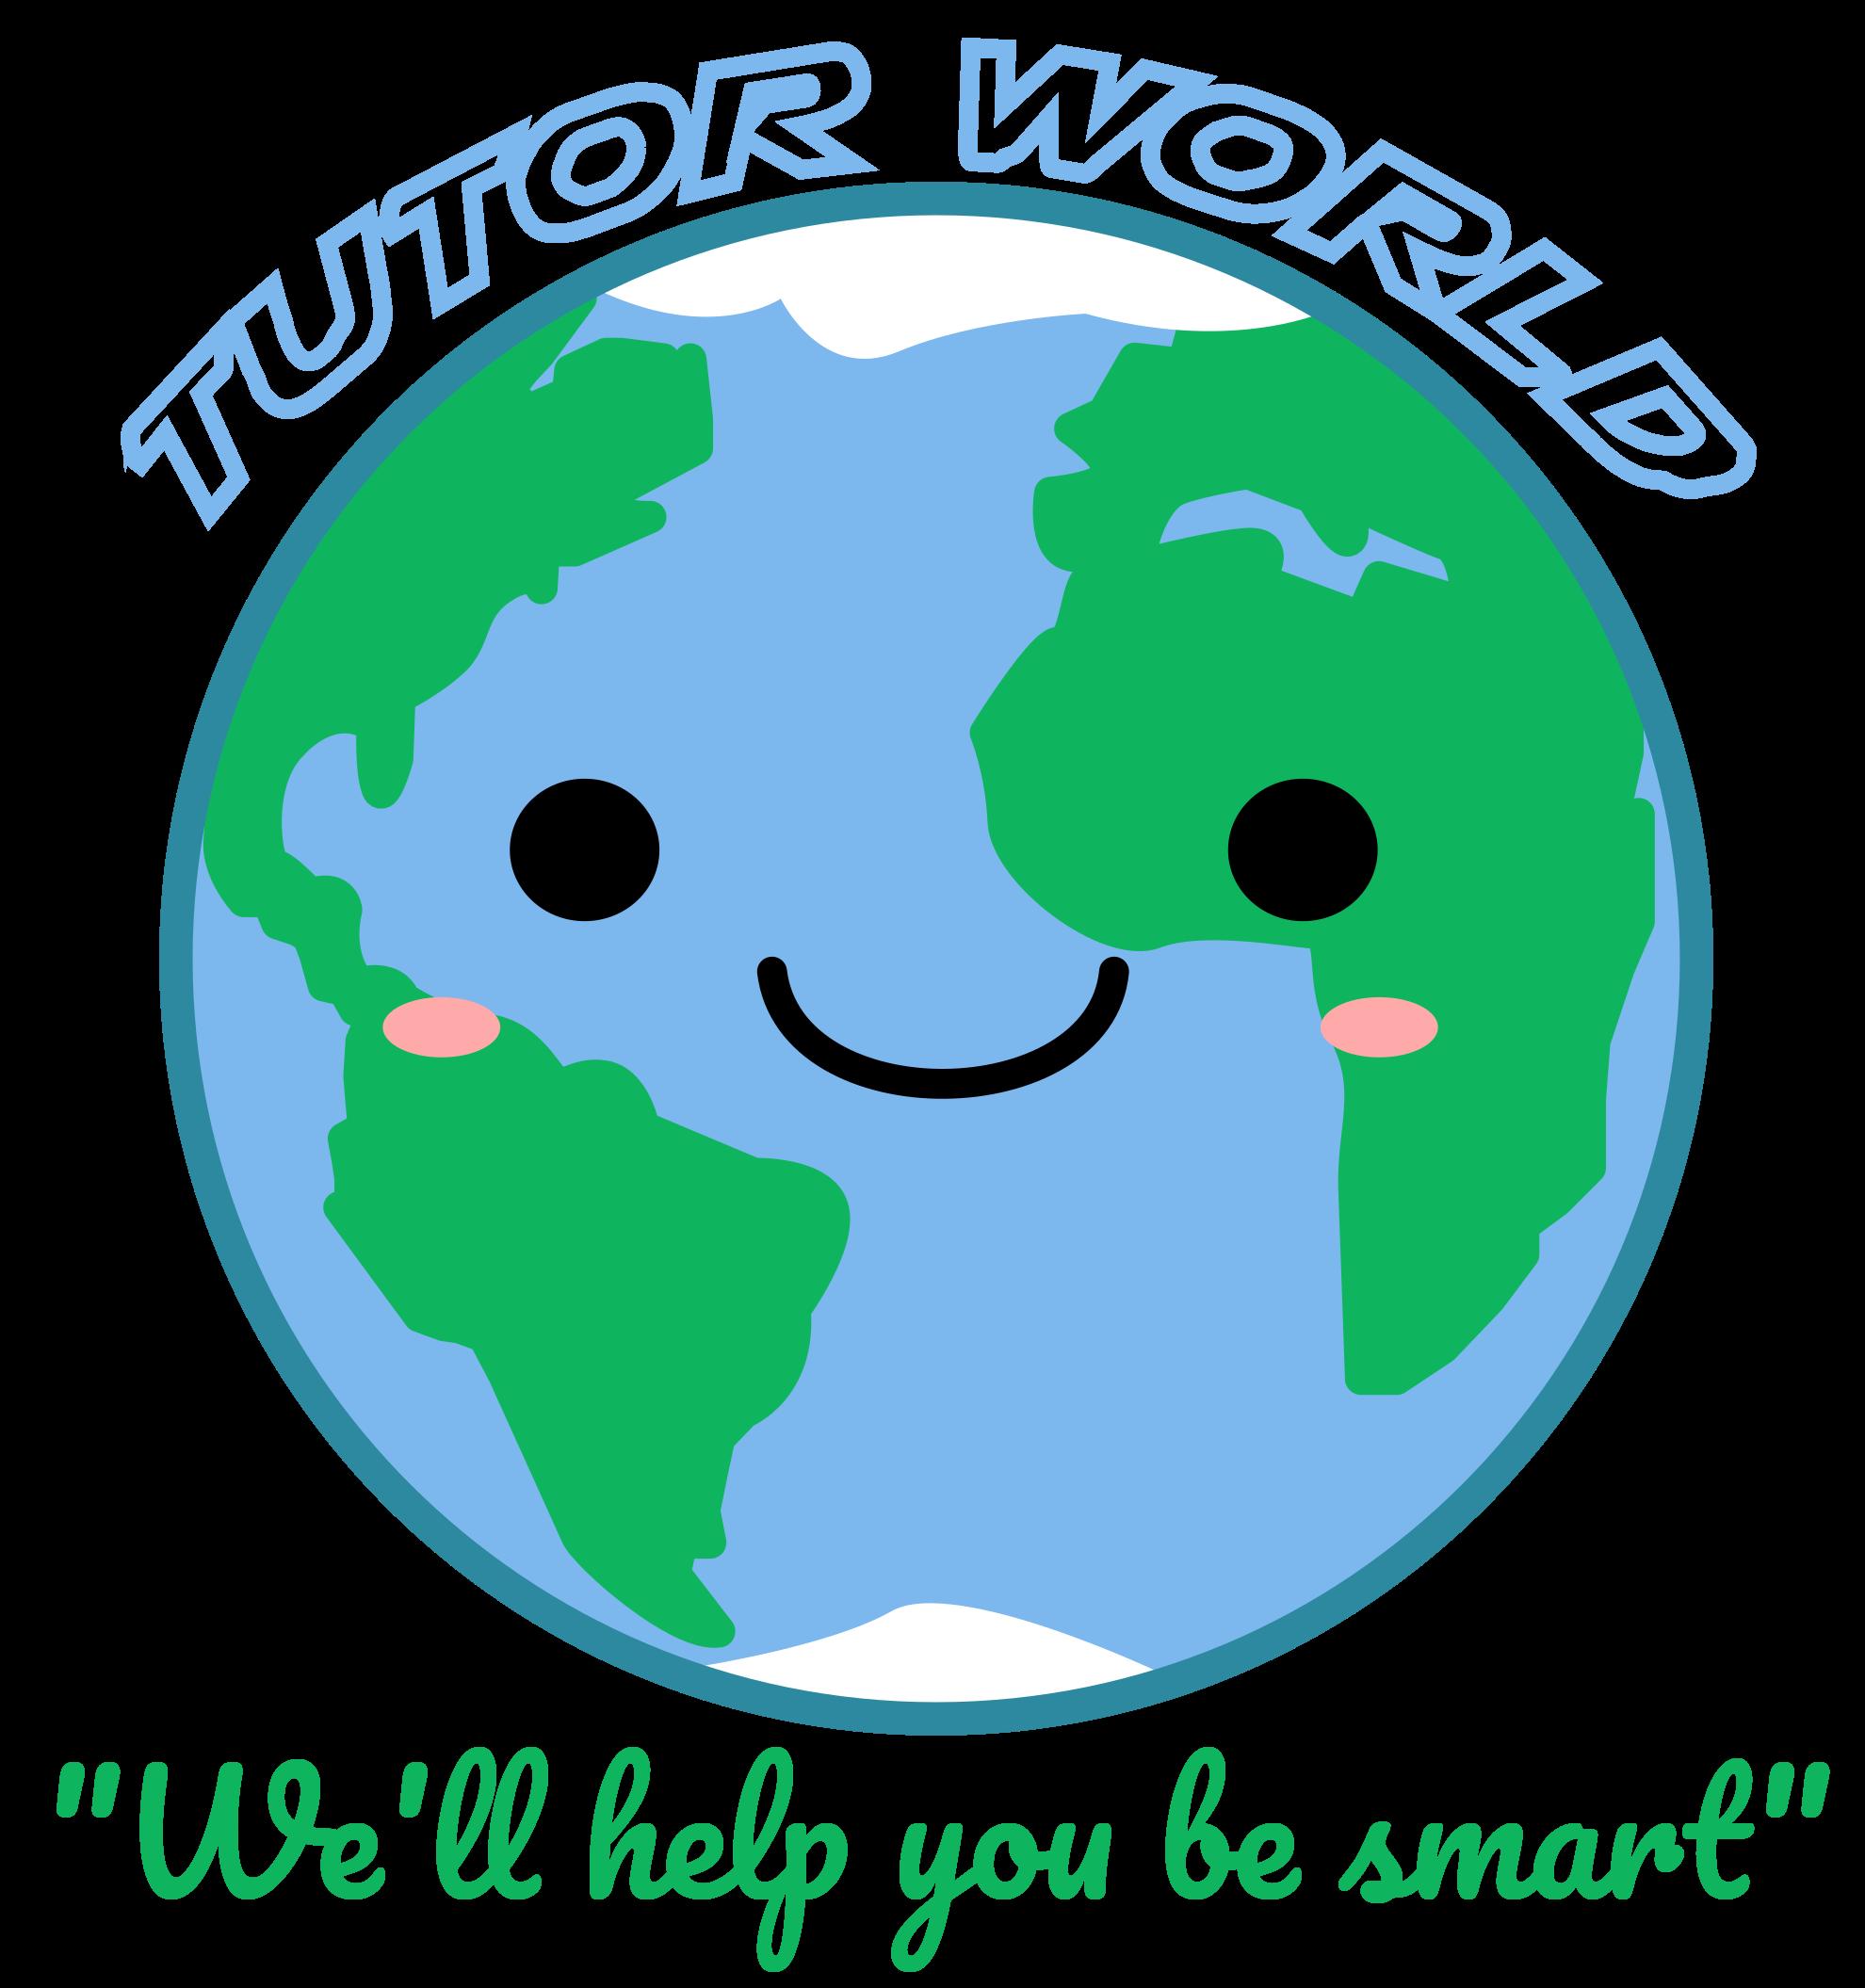 clip library Tutor World